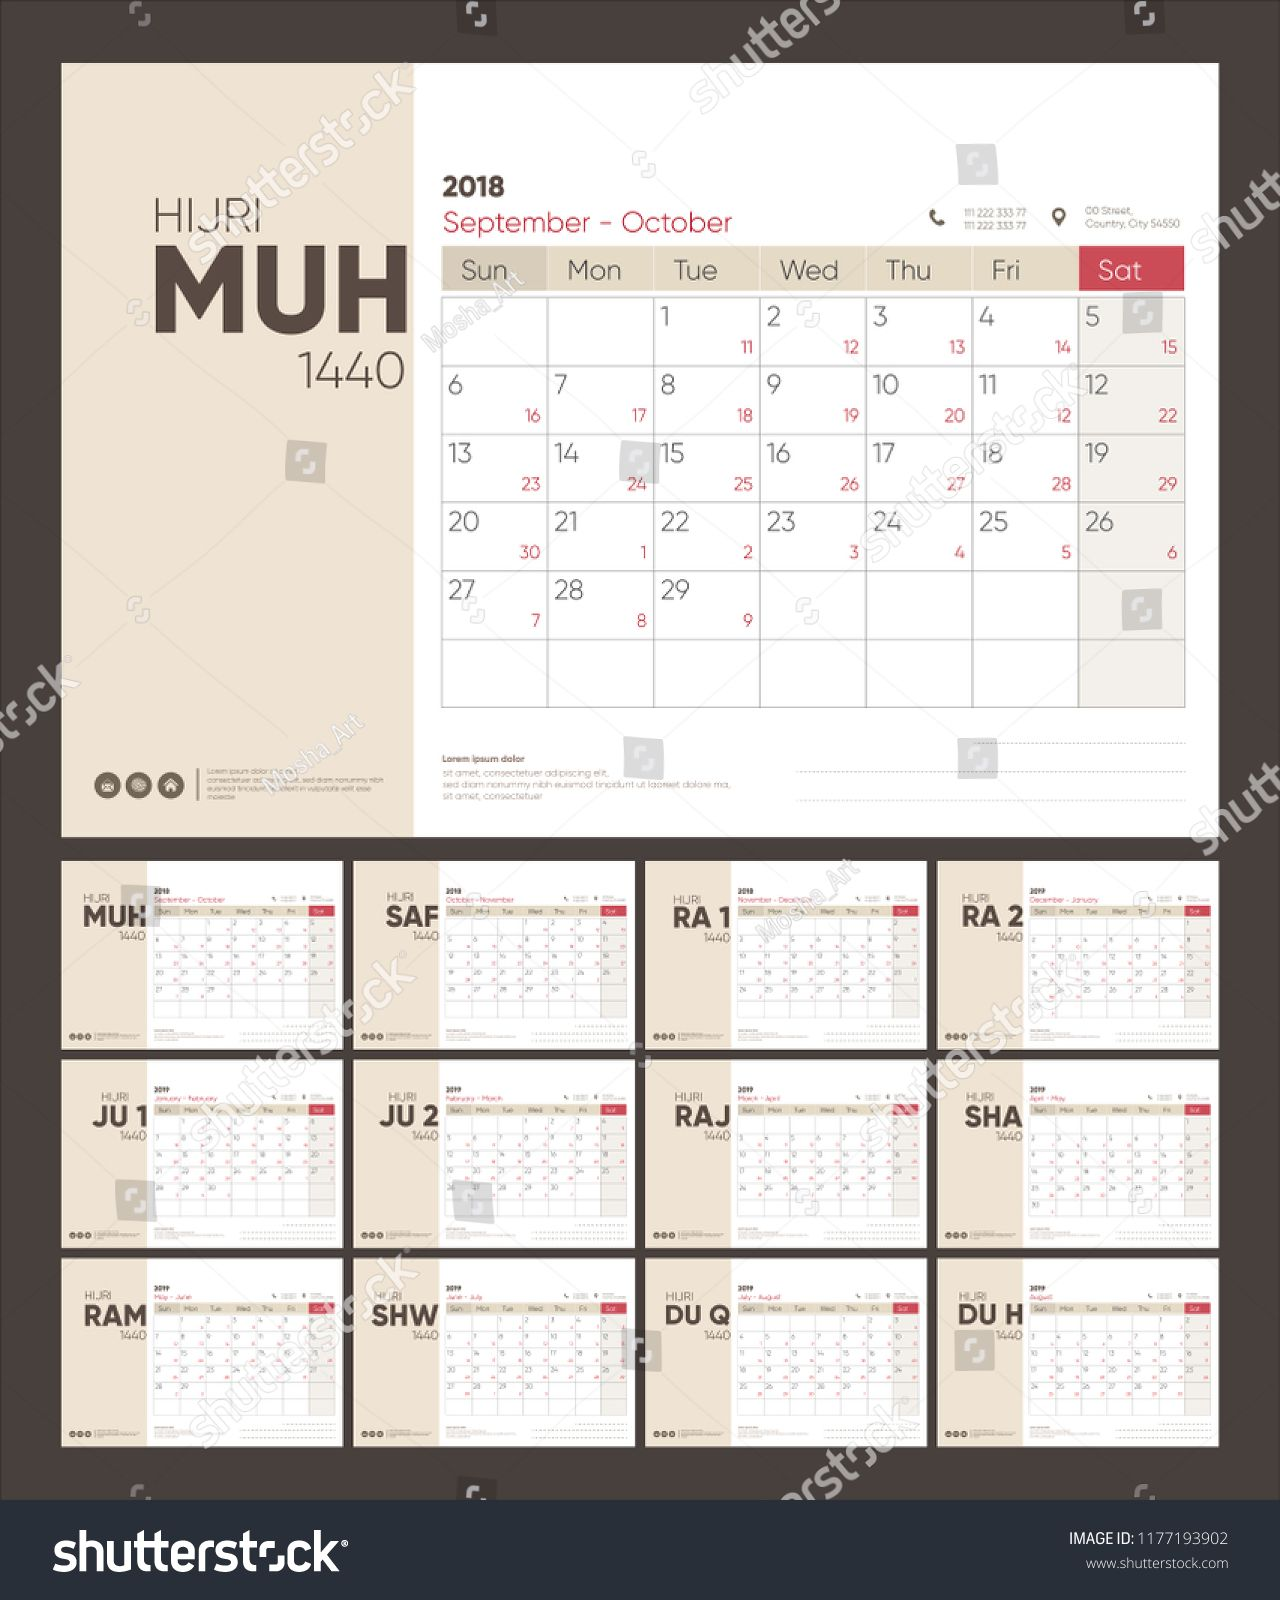 Hijri And Gregorian Calendar Planner Design For 1440 2019 Week